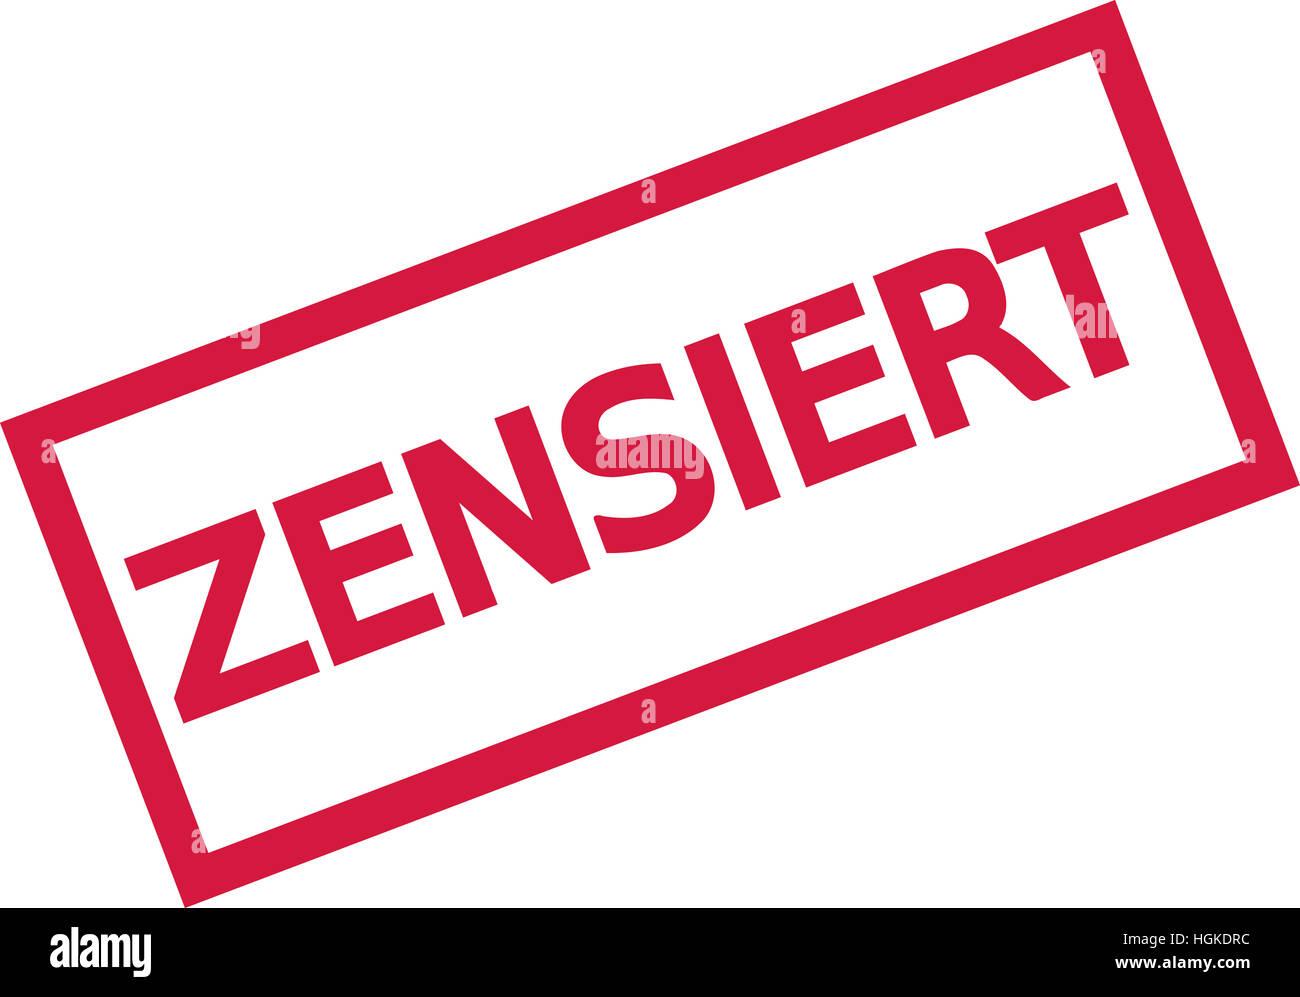 Censored stamp sign - german - Stock Image